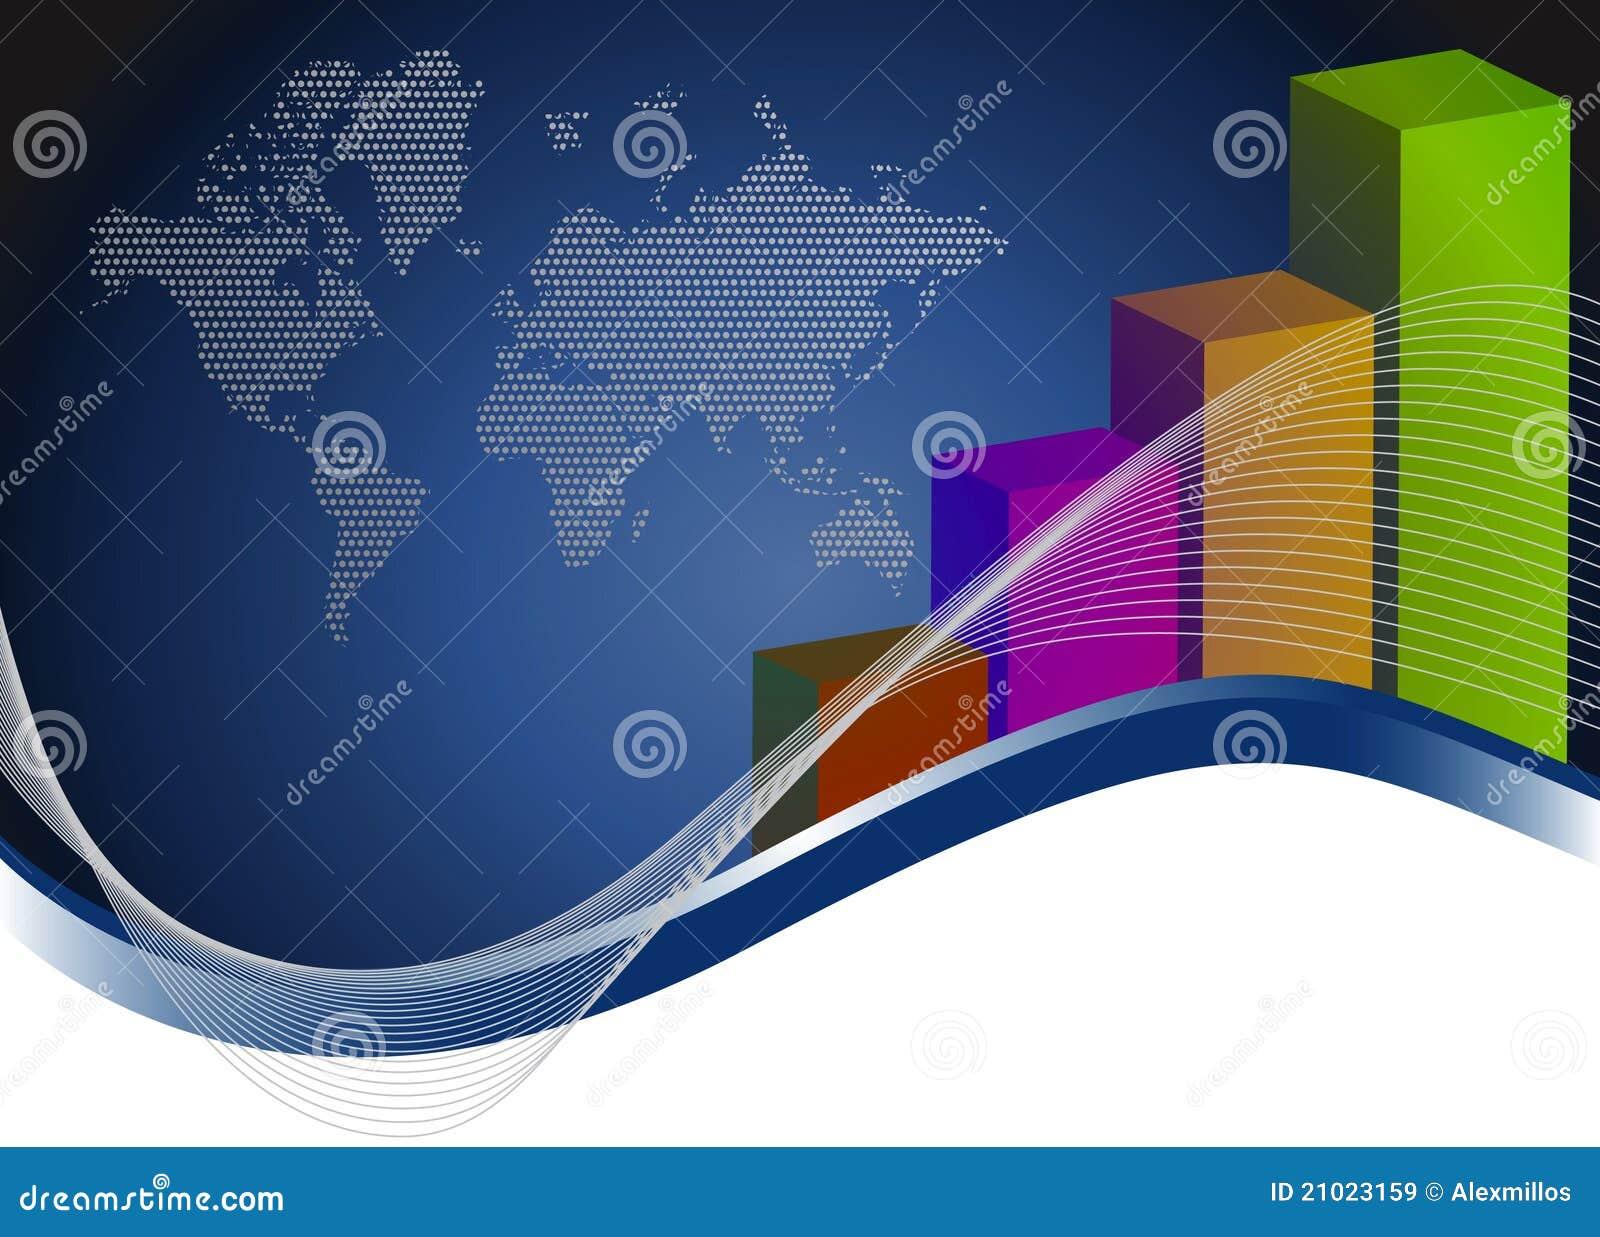 Royalty Free Stock Images  Creative bar graphs and mapCreative Bar Graphs